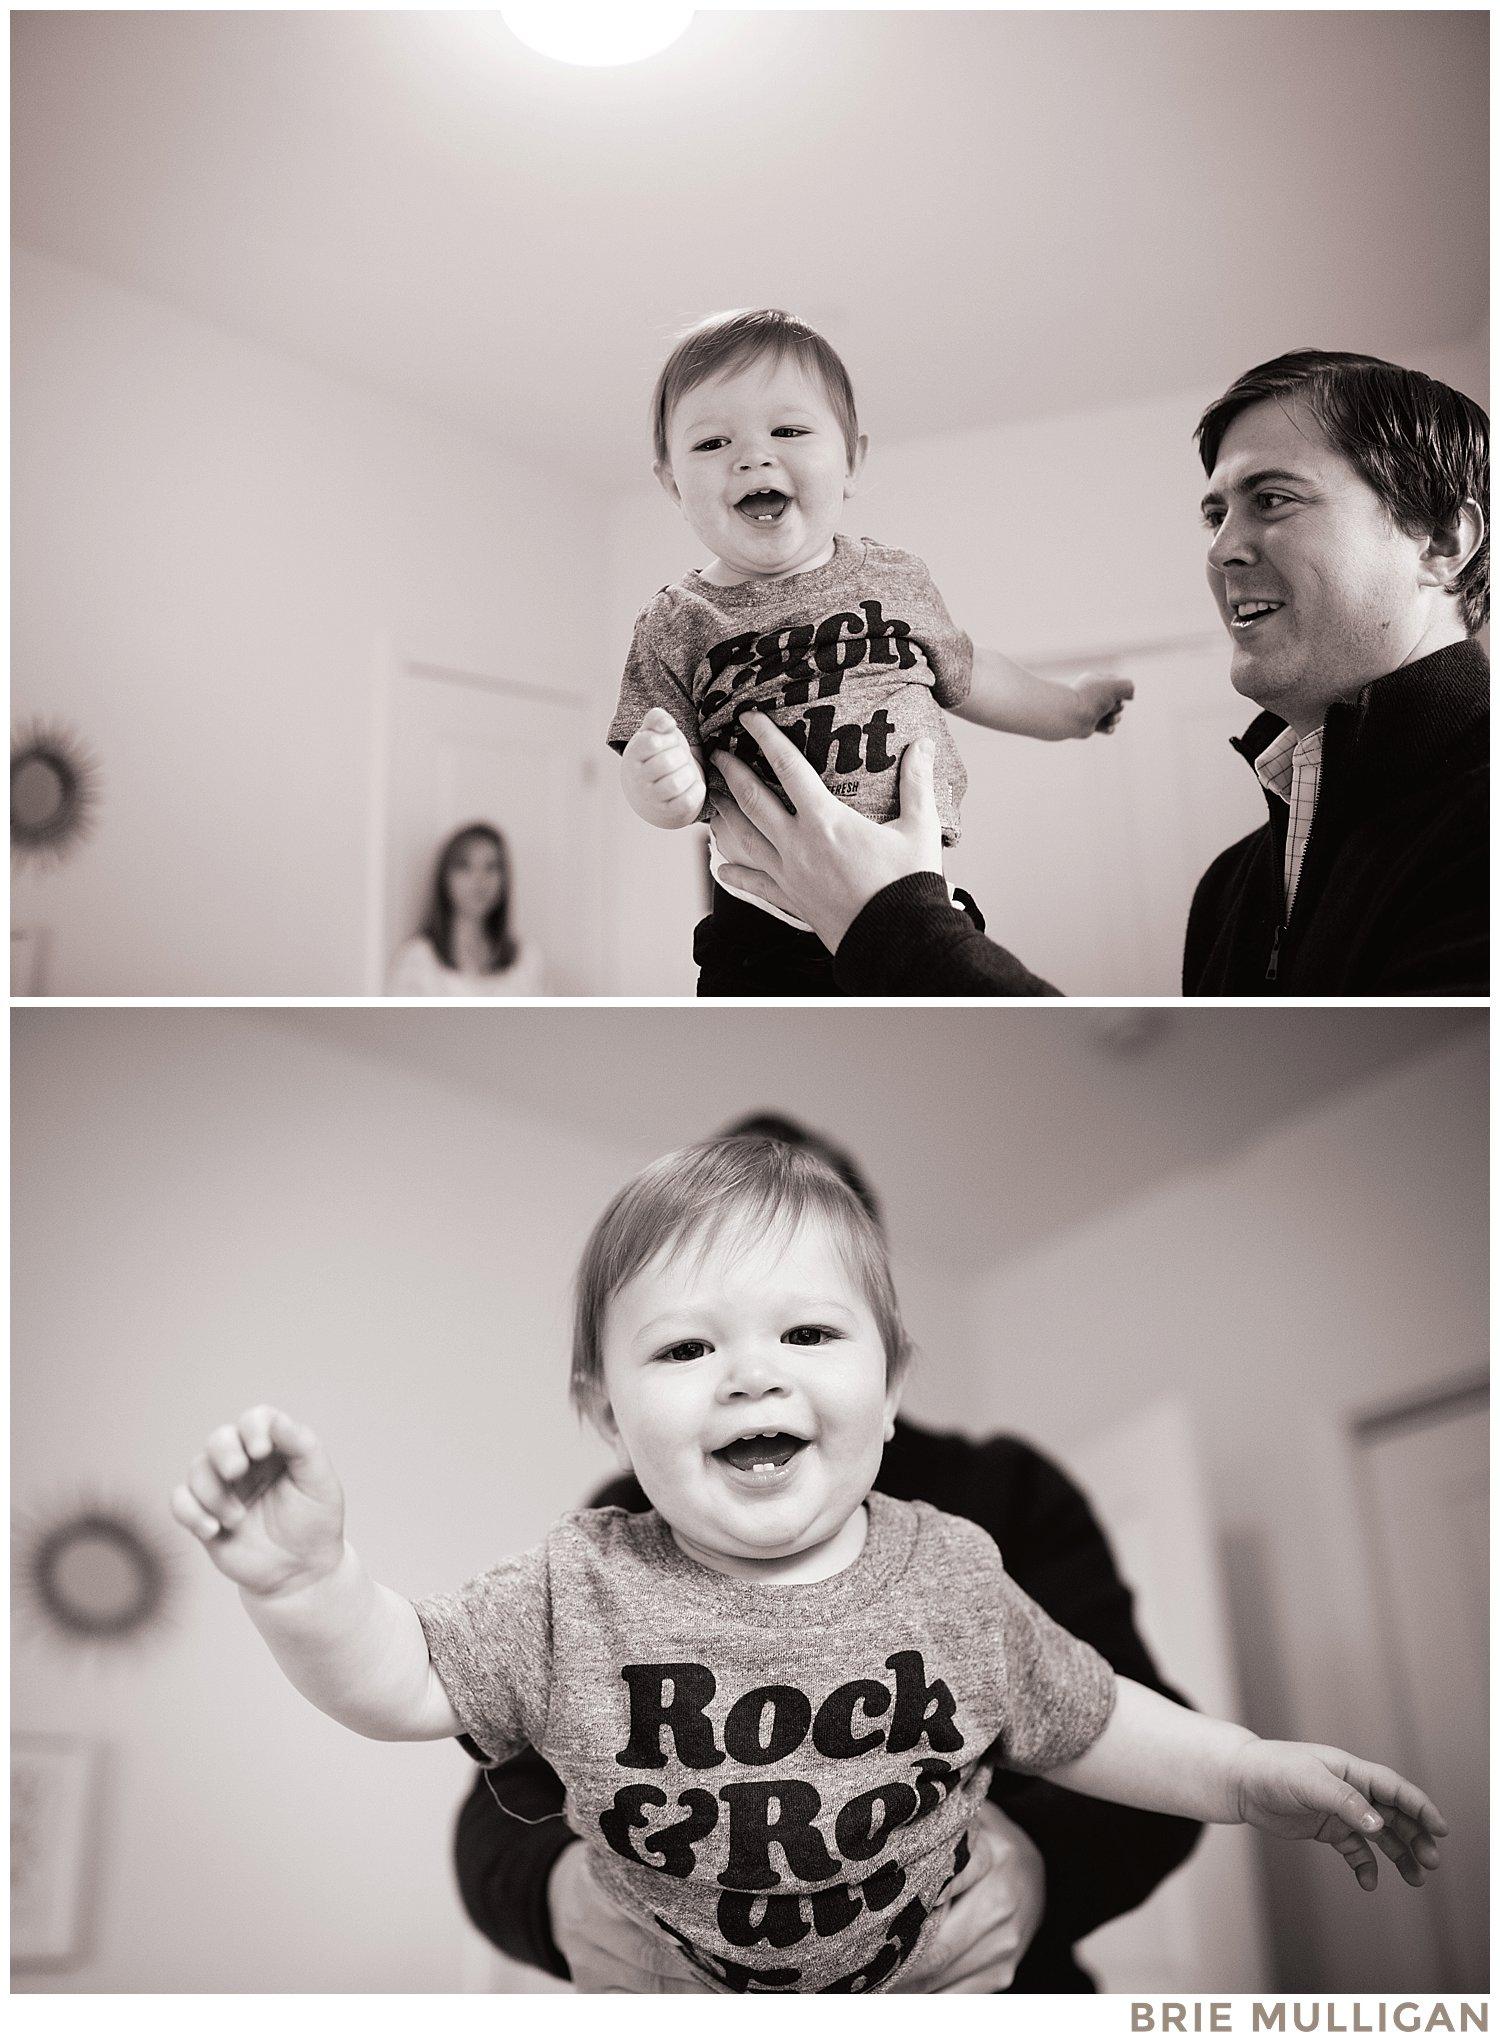 Brie-Mulligan-Family-and-Newborn-Photographer-NYC-and-Northern-NJ_0120.jpg